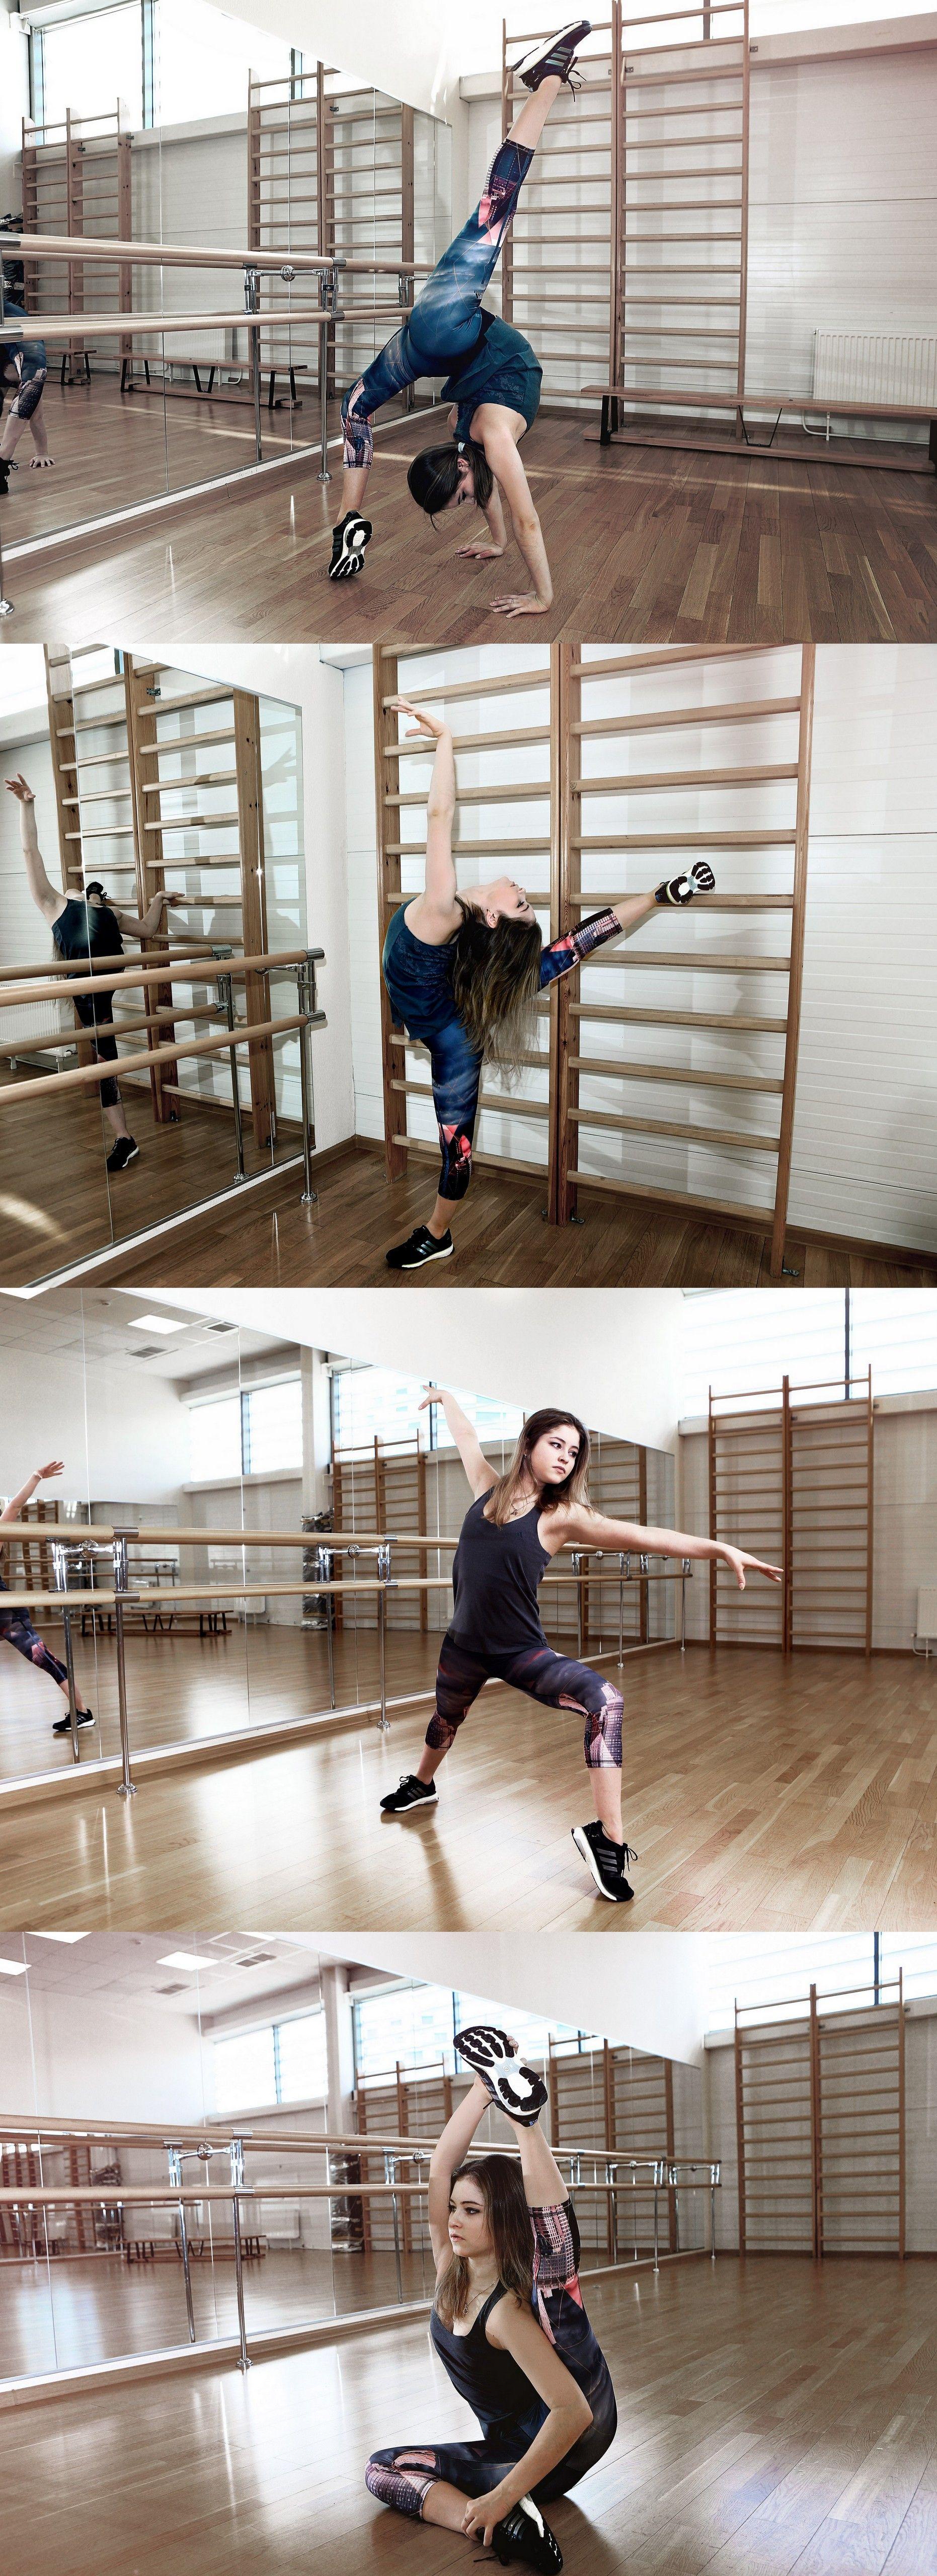 Julia Lipnitskaya - ユリア・リプニツカヤ #JuliaLipnitskaya #ユリアリプニツカヤ #FigureSkate #フィギュアスケート